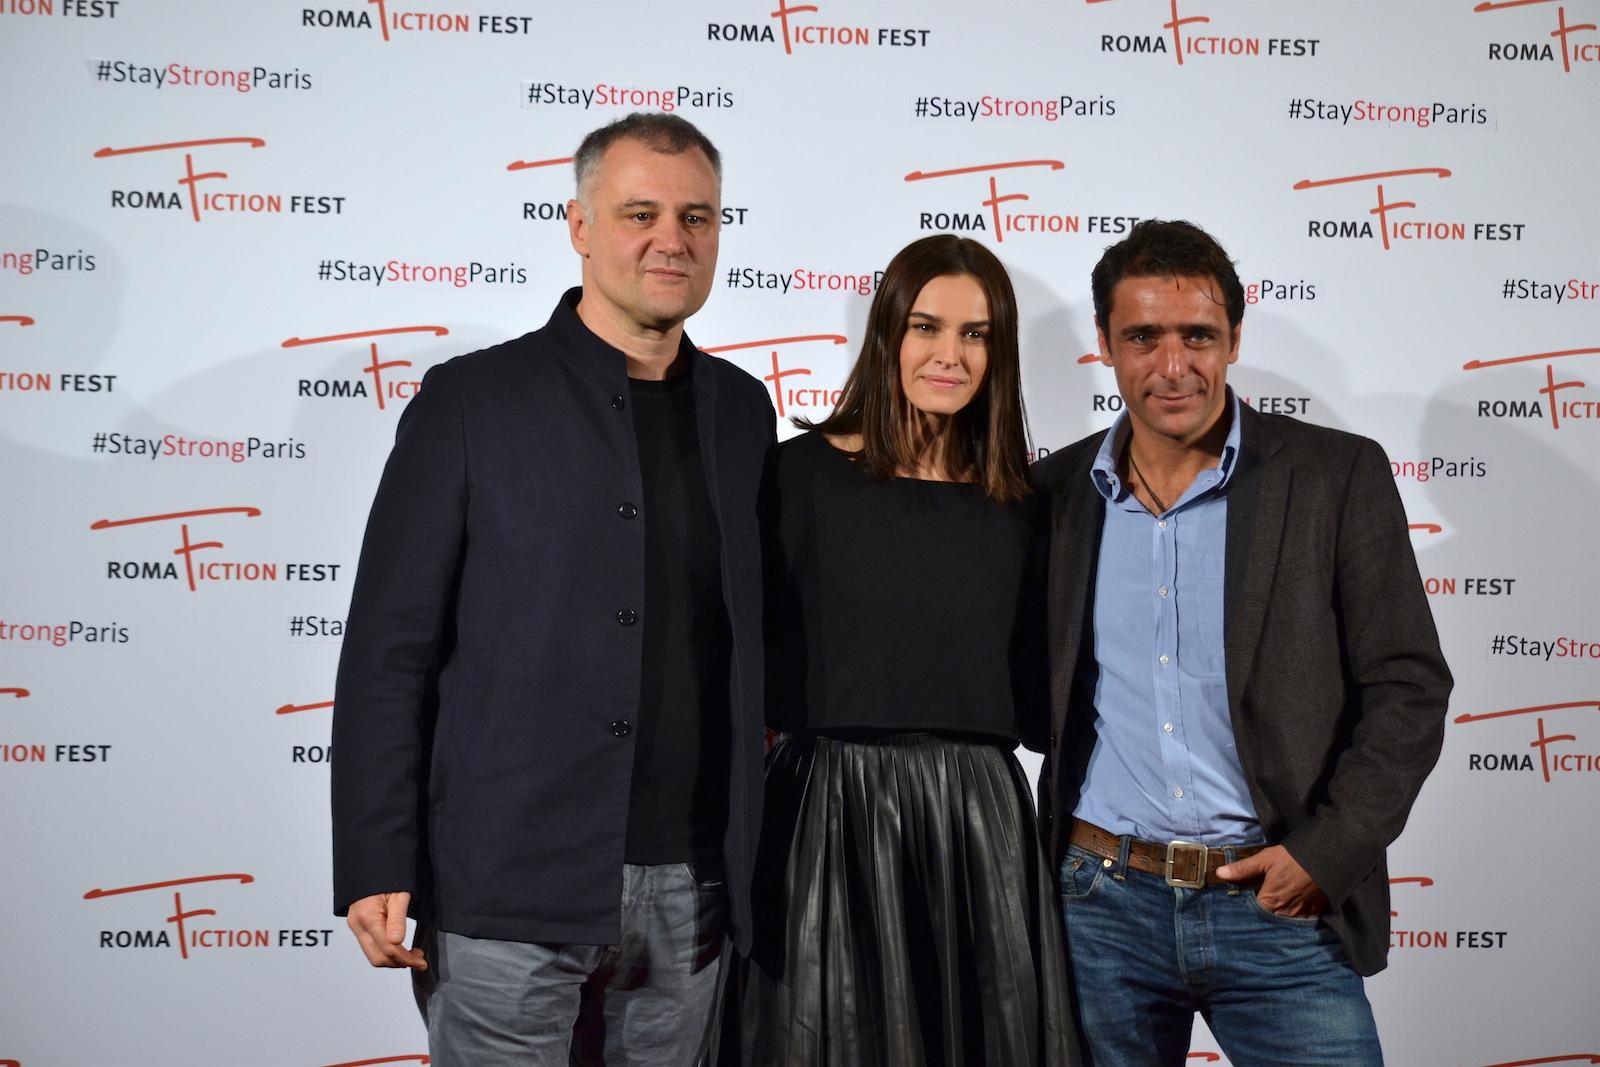 Roma Fiction Fest 2015: Lucio Pellegrini, Kasia Smutniake Adriano Giannini al photocall di Limbo